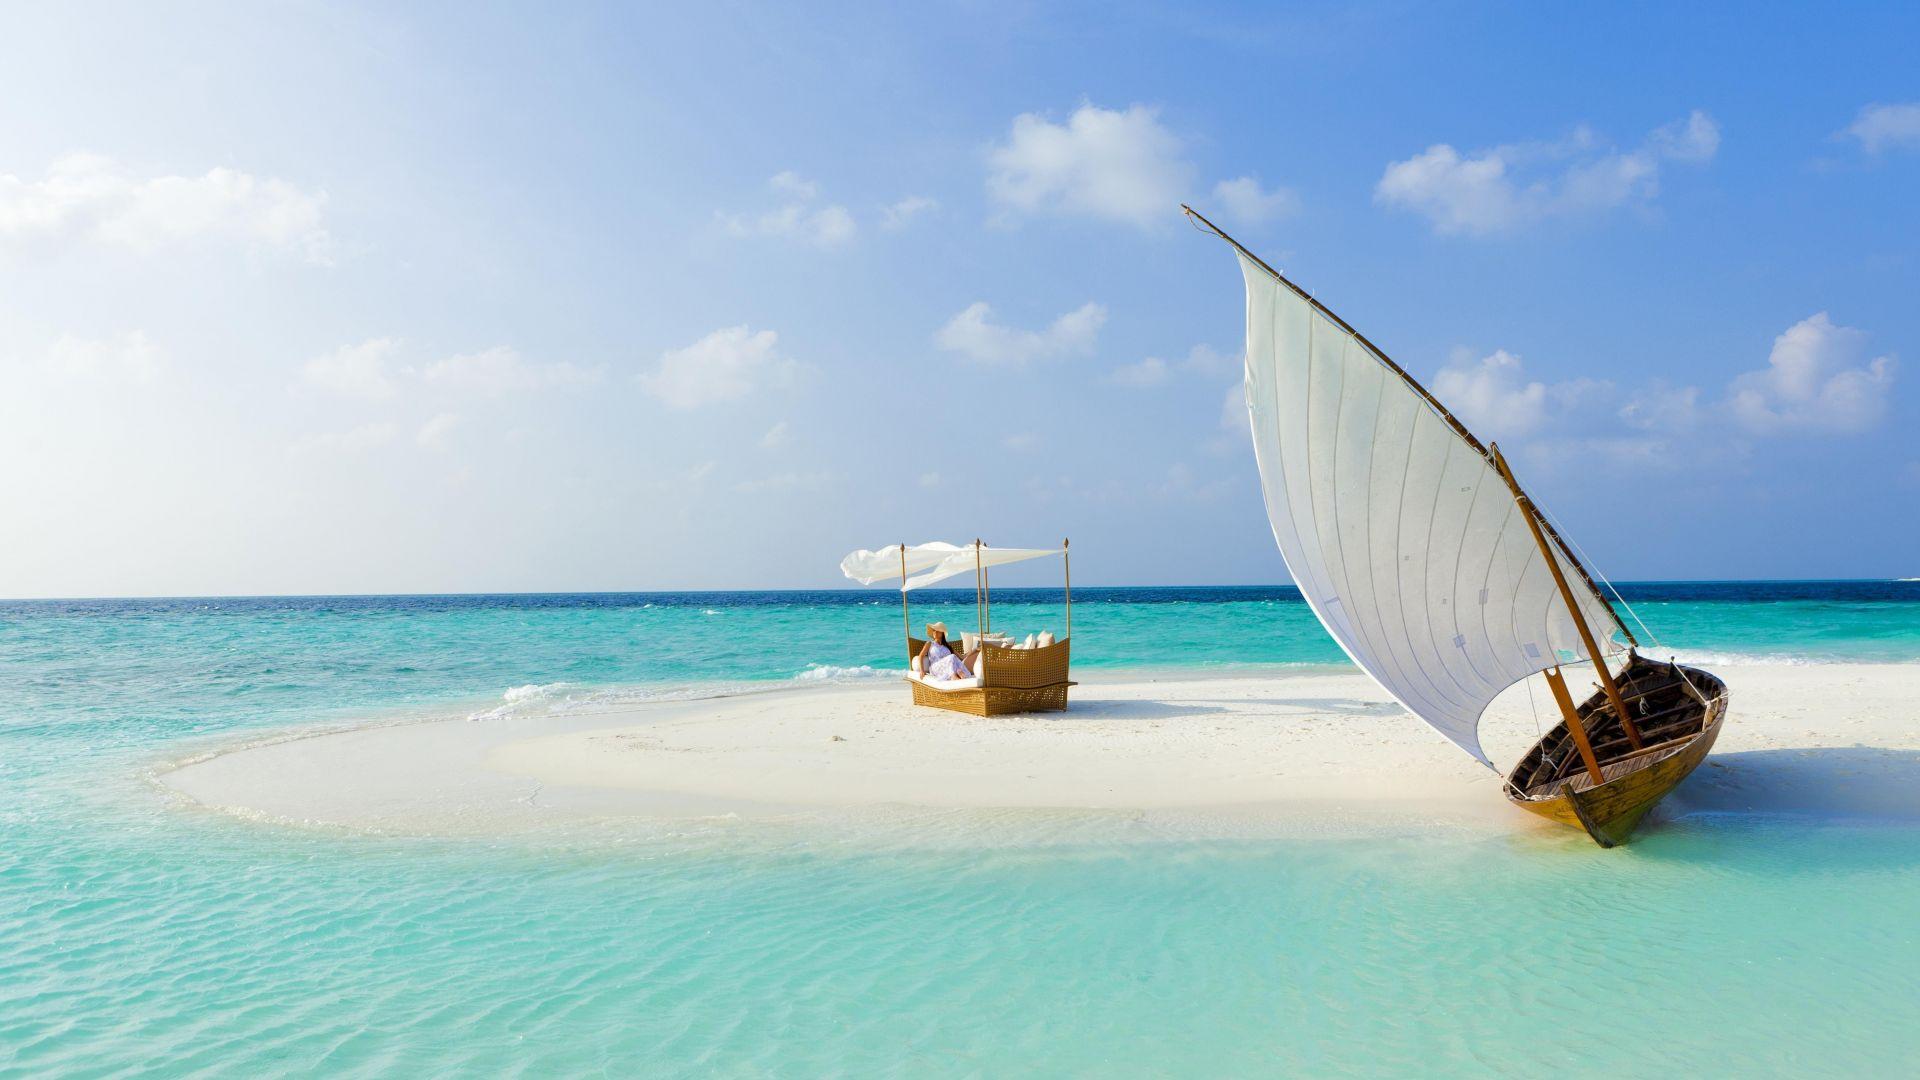 Wallpaper Maldives beach, island, beach, ship, holiday